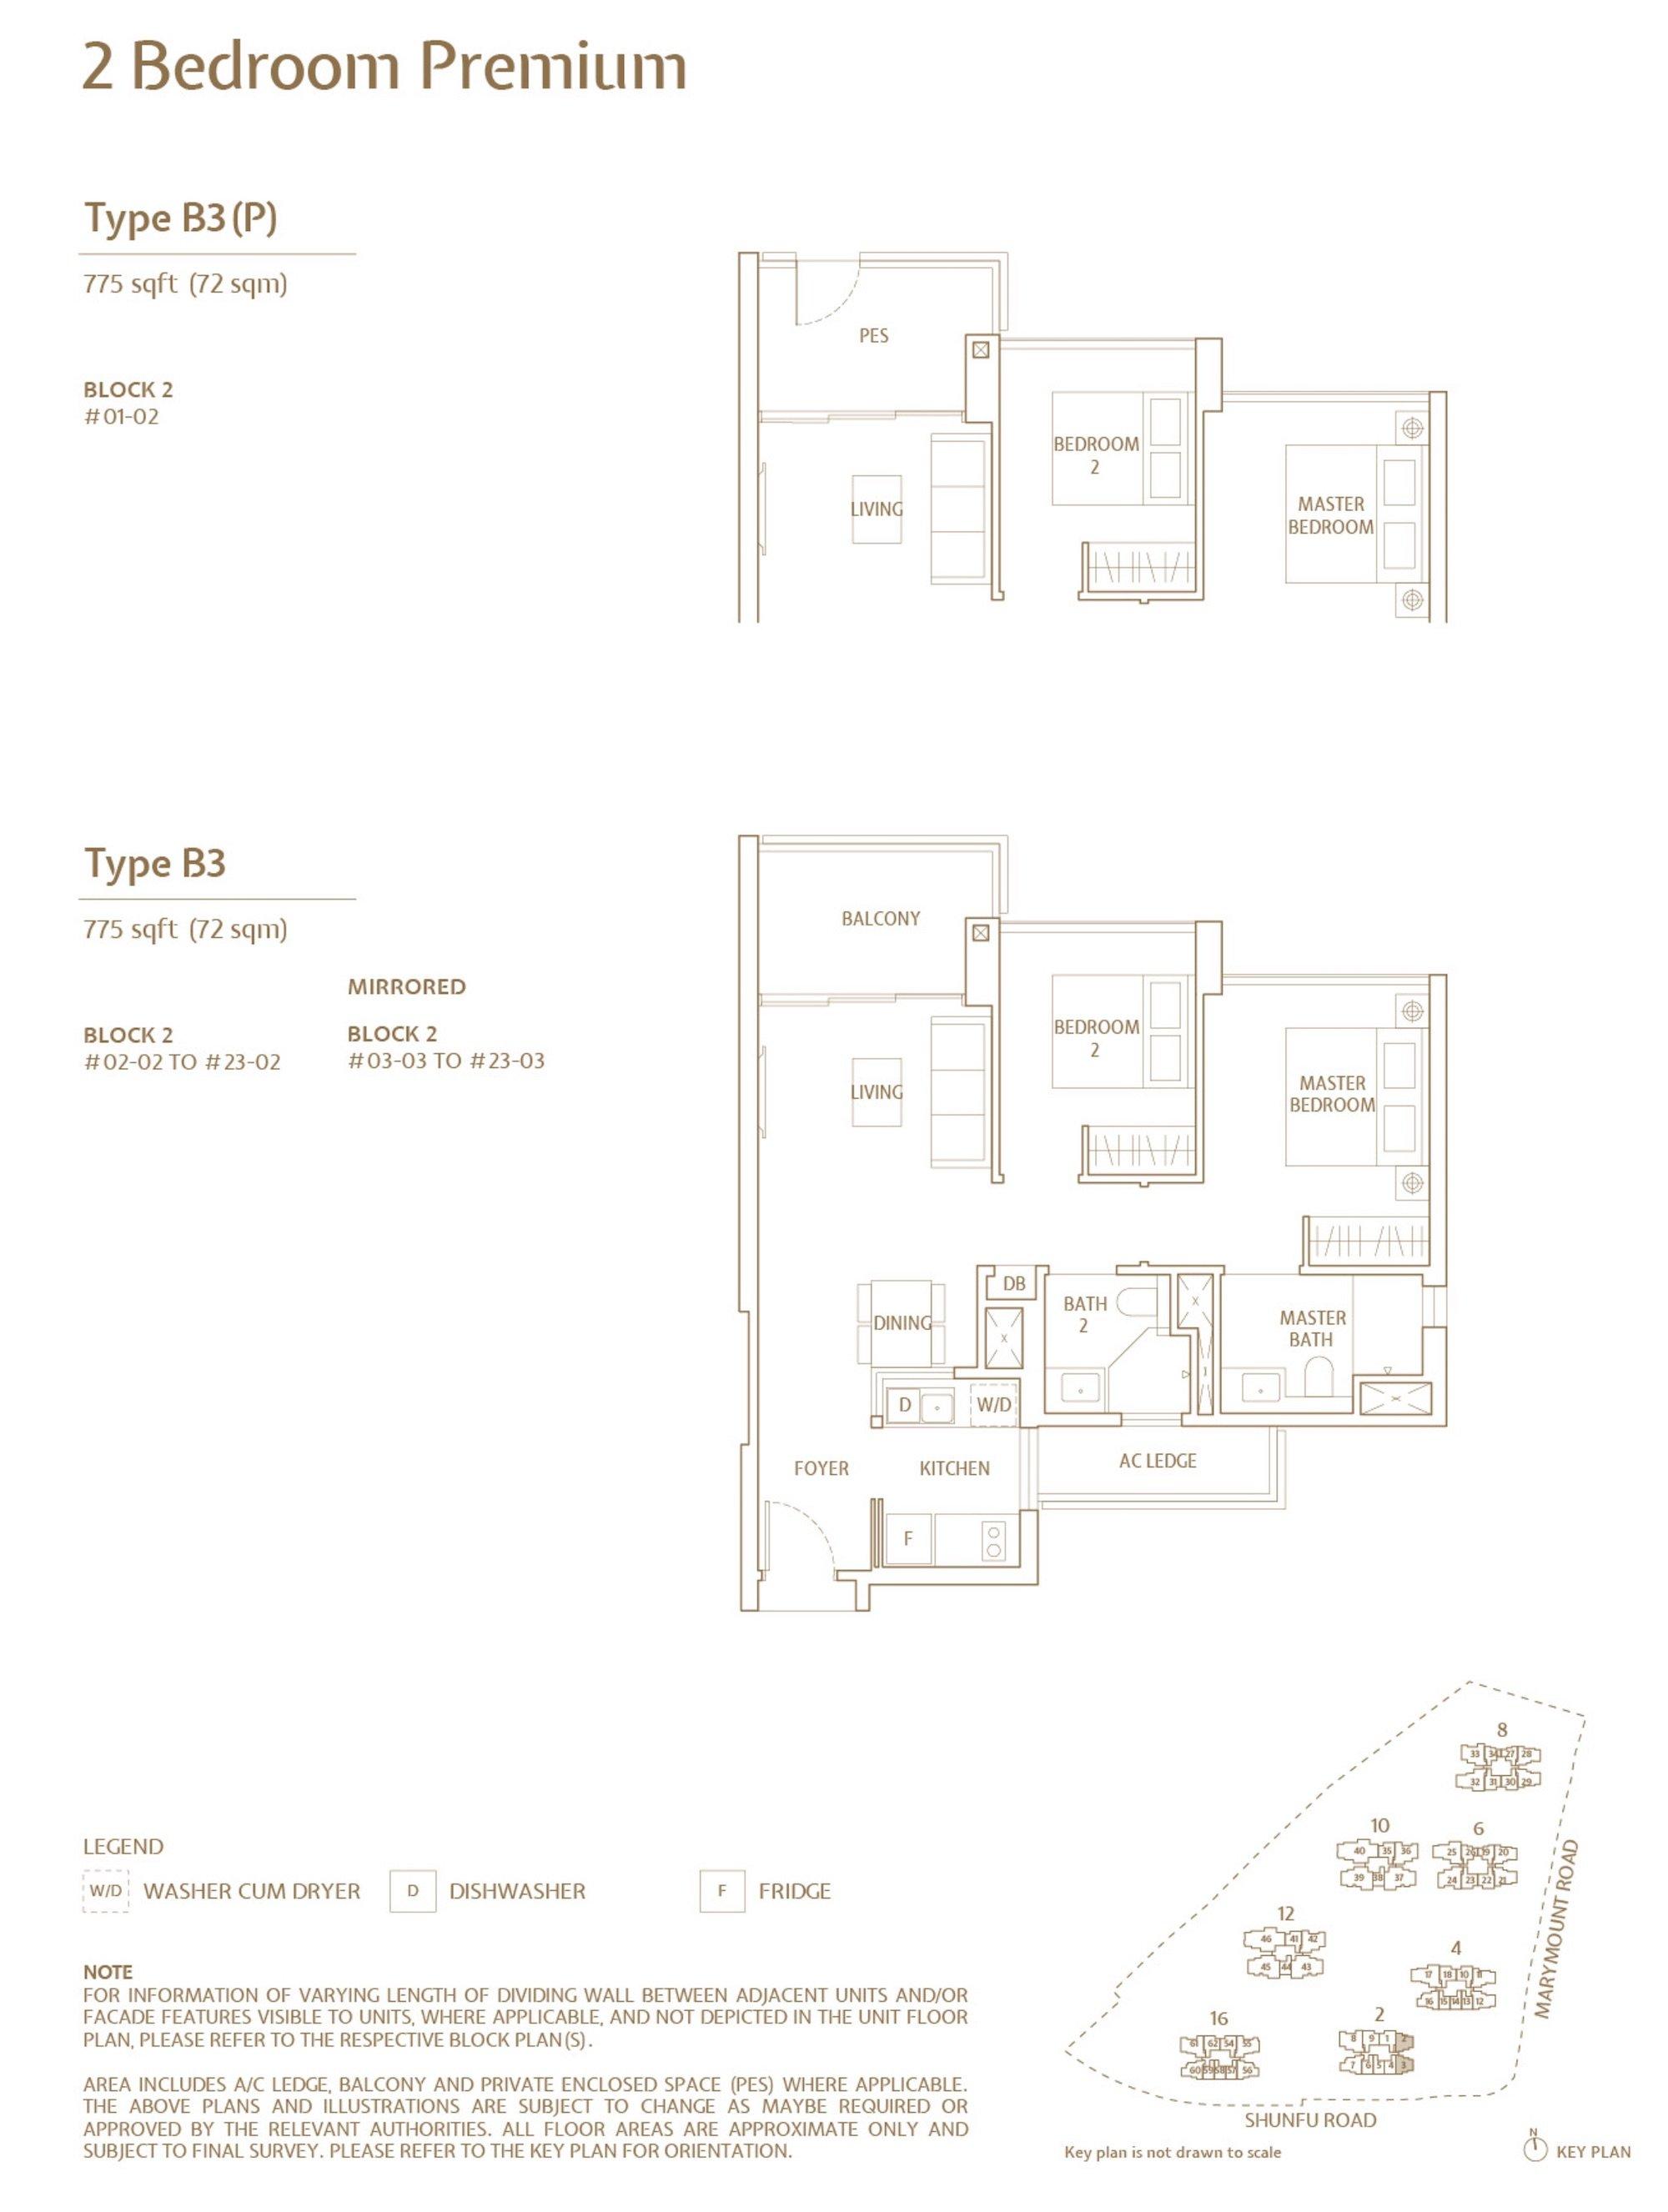 Jadescape 顺福轩 condo 2 bedroom type B3